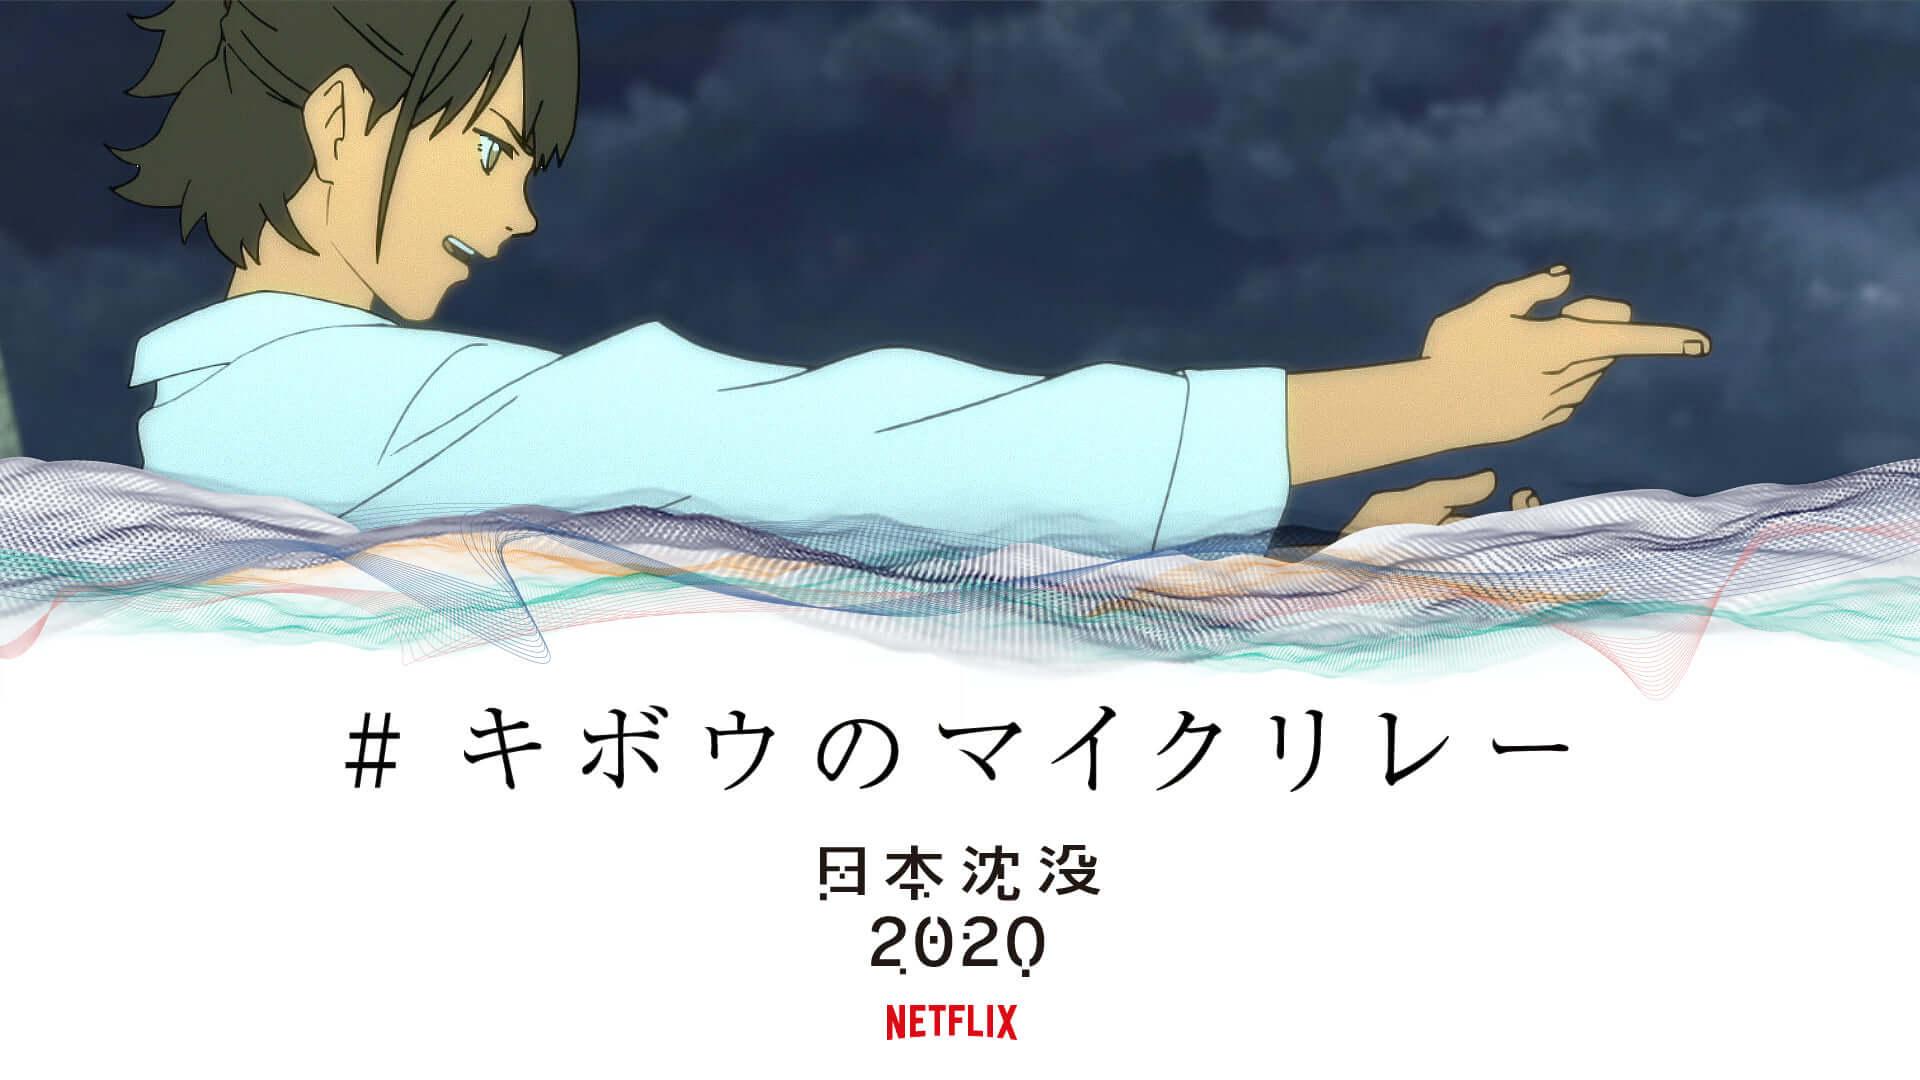 Netflix『日本沈没2020』のスピンオフ企画「シズマヌキボウ」が始動!向井太一、Daichi Yamamotoら参加のオリジナル曲が近日公開 art200710_japansinks_2-1920x1080